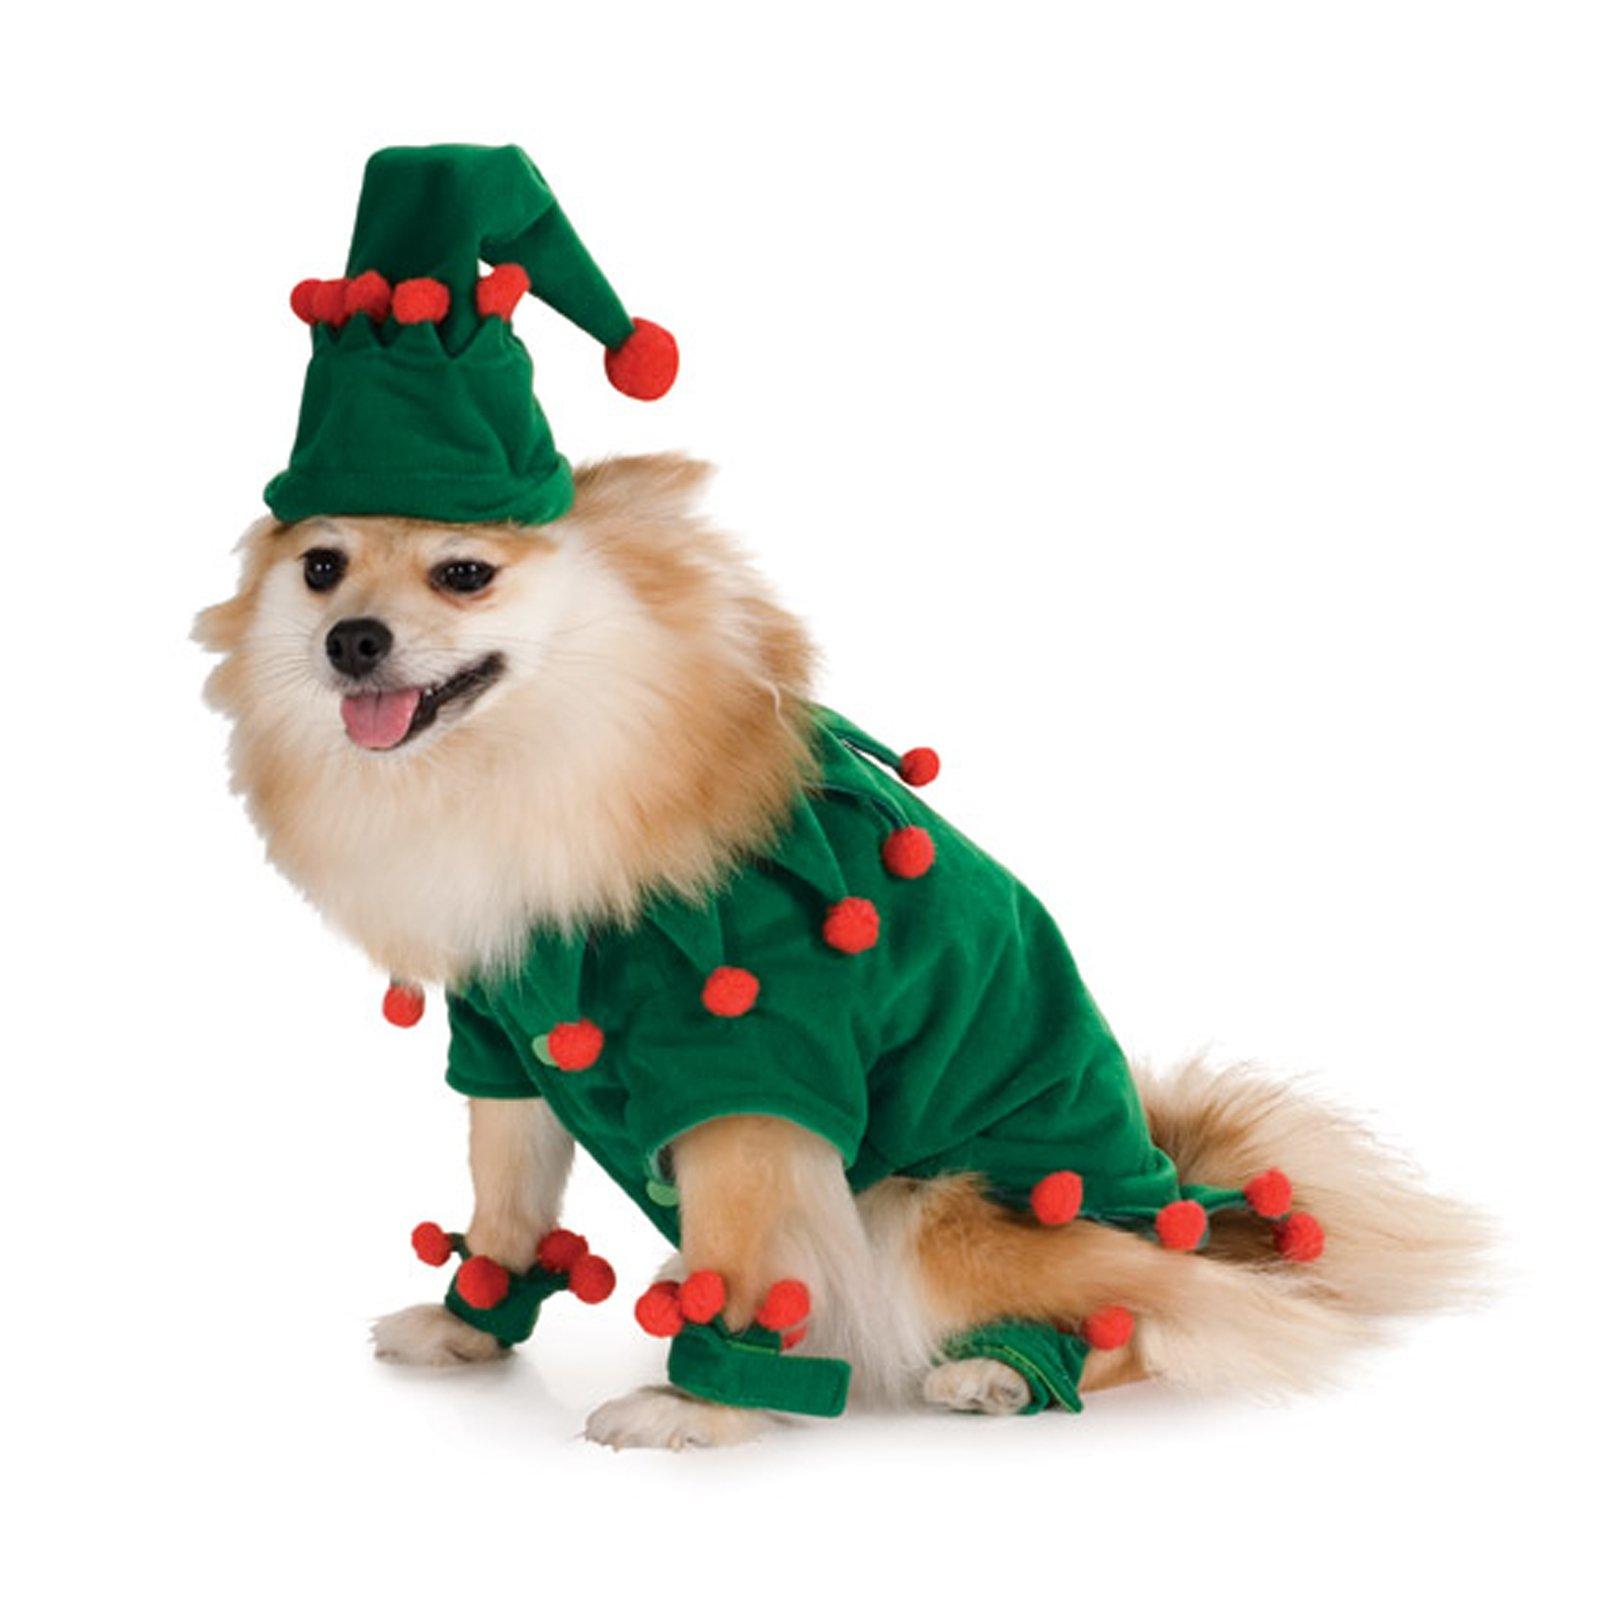 Pet Christmas Costumes photo - 1